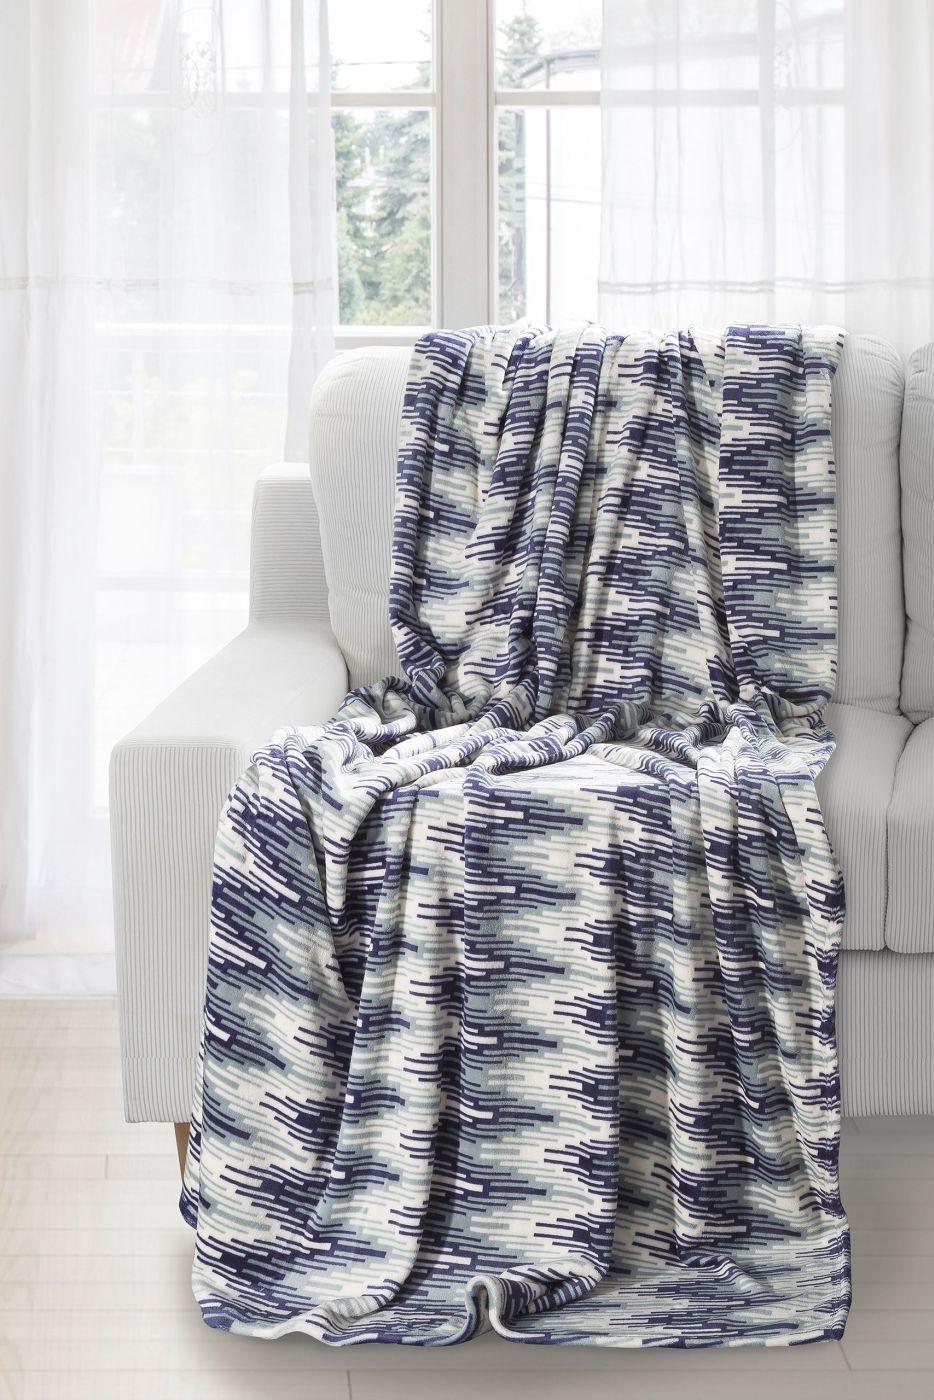 Patura Lucas Blue / White 150 x 200 cm